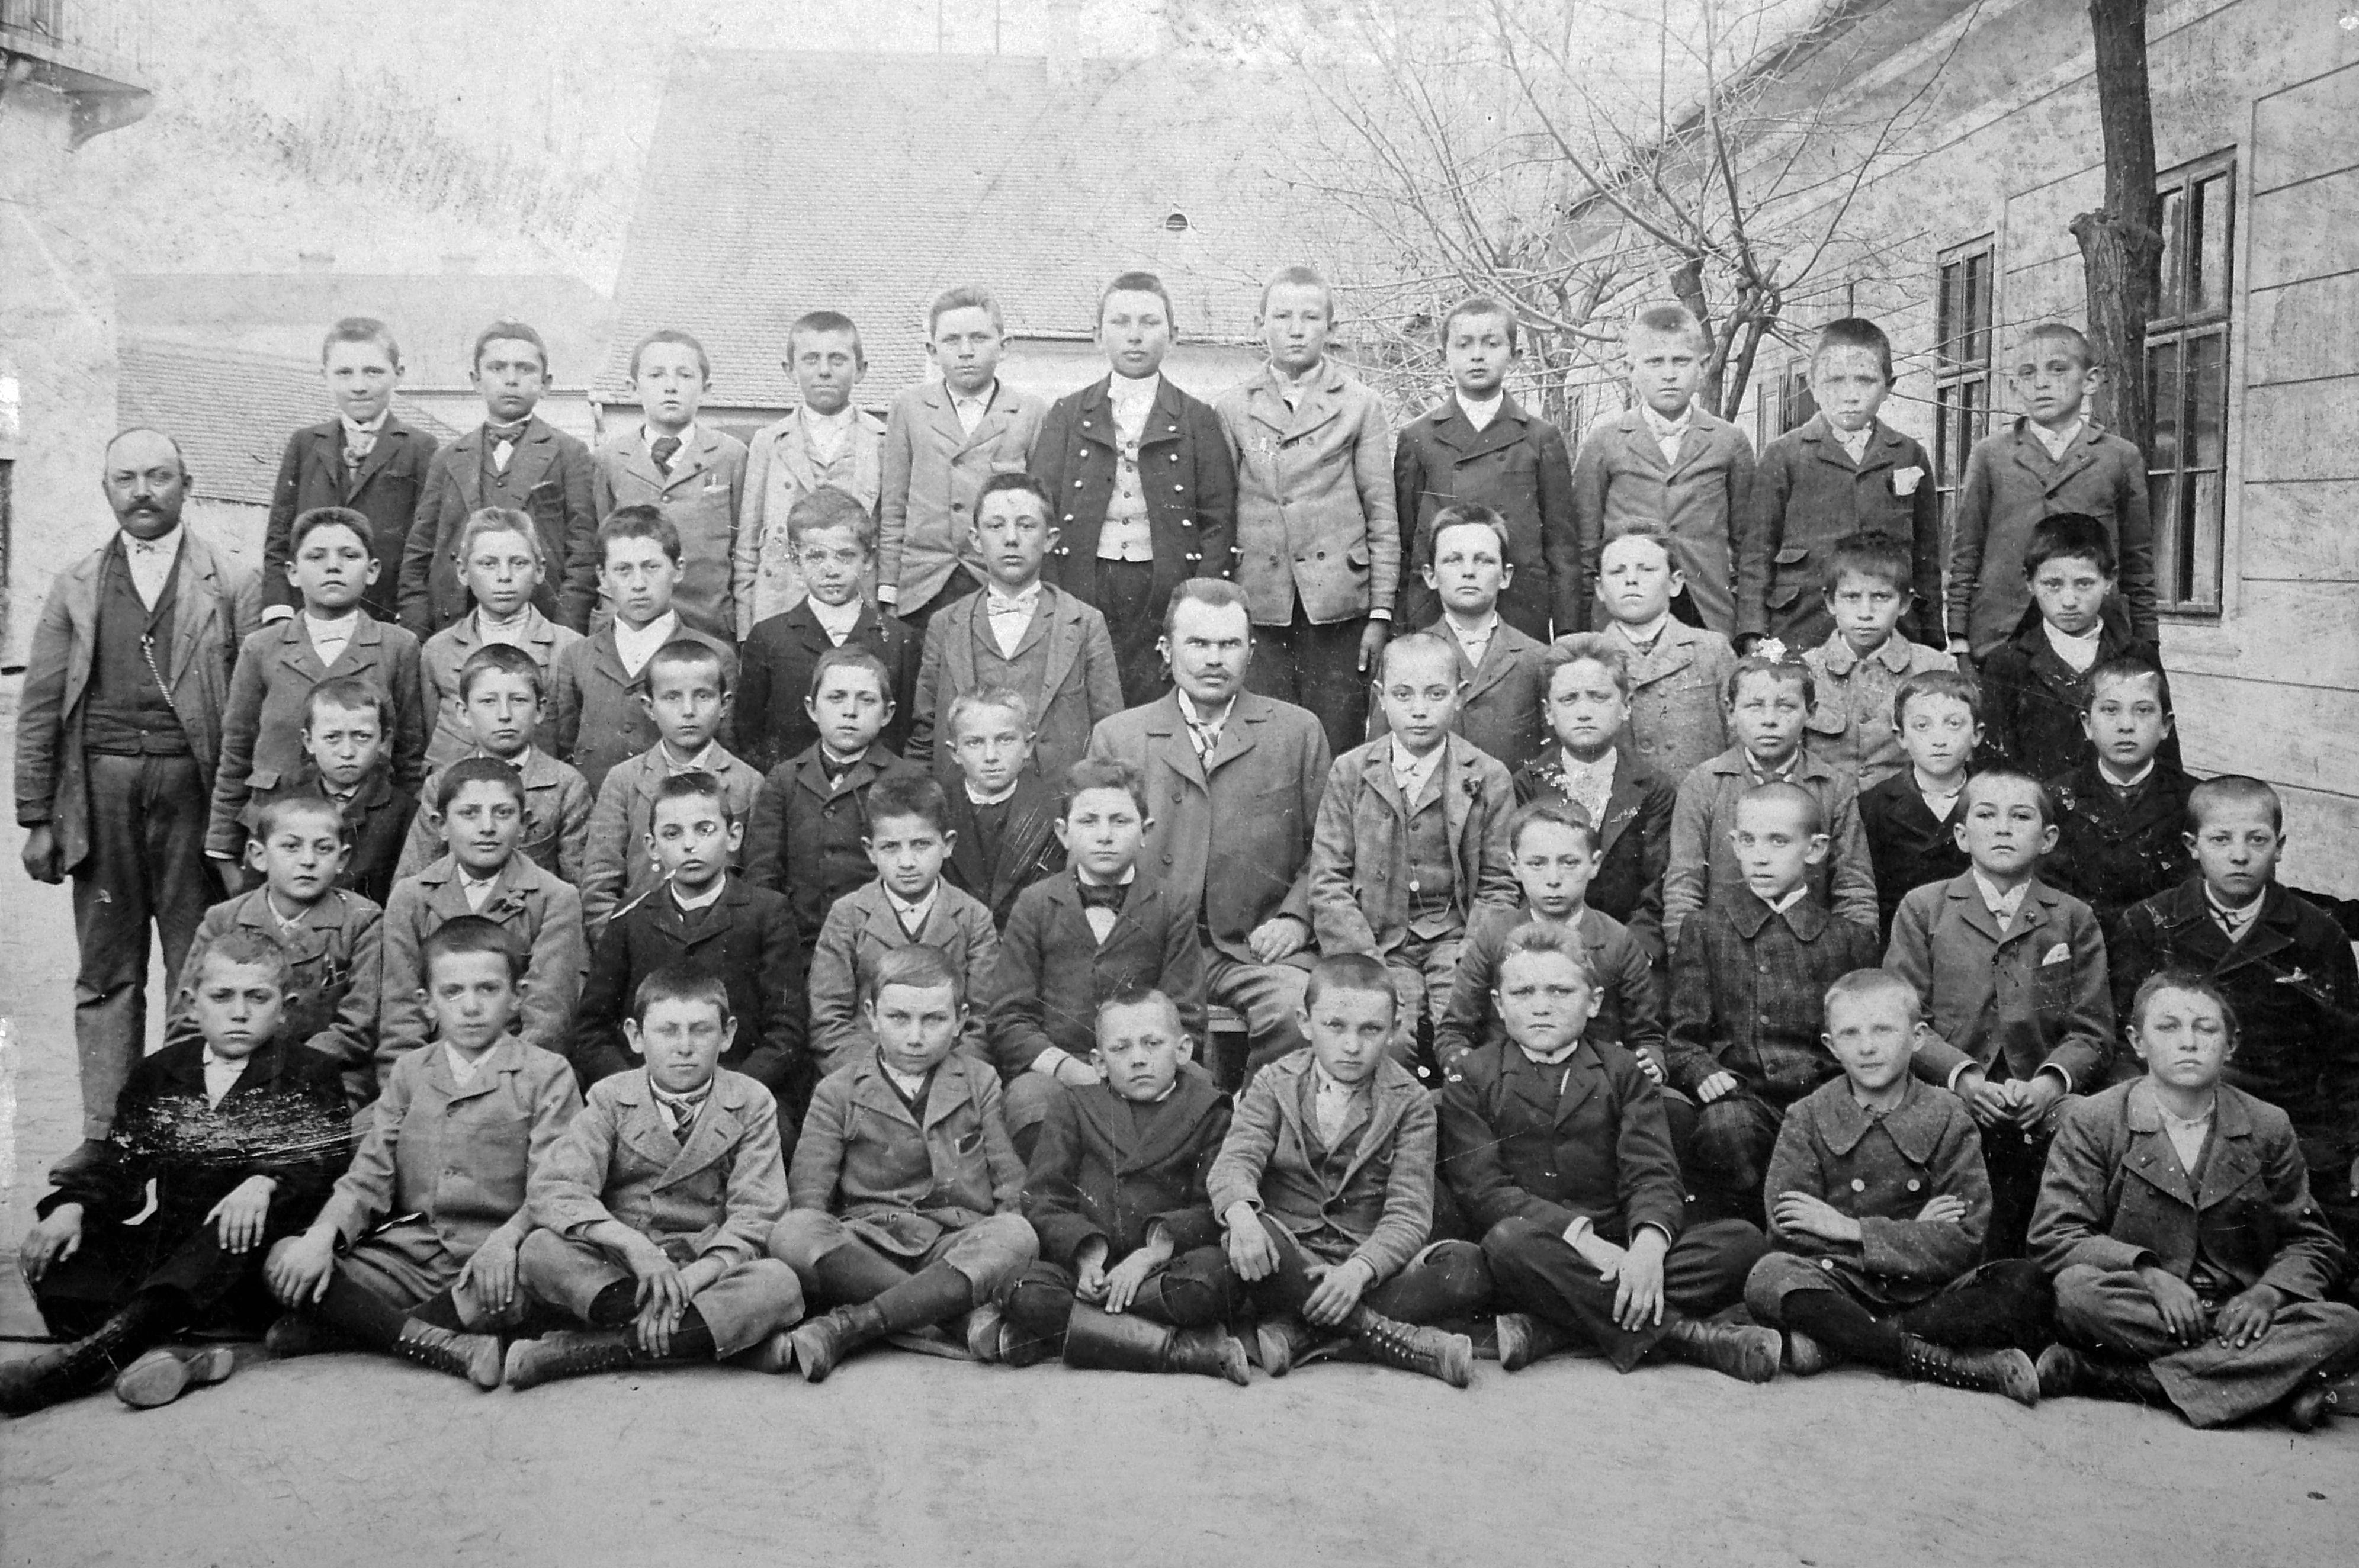 File:Tableau, school, class photo, yard, teacher Fortepan